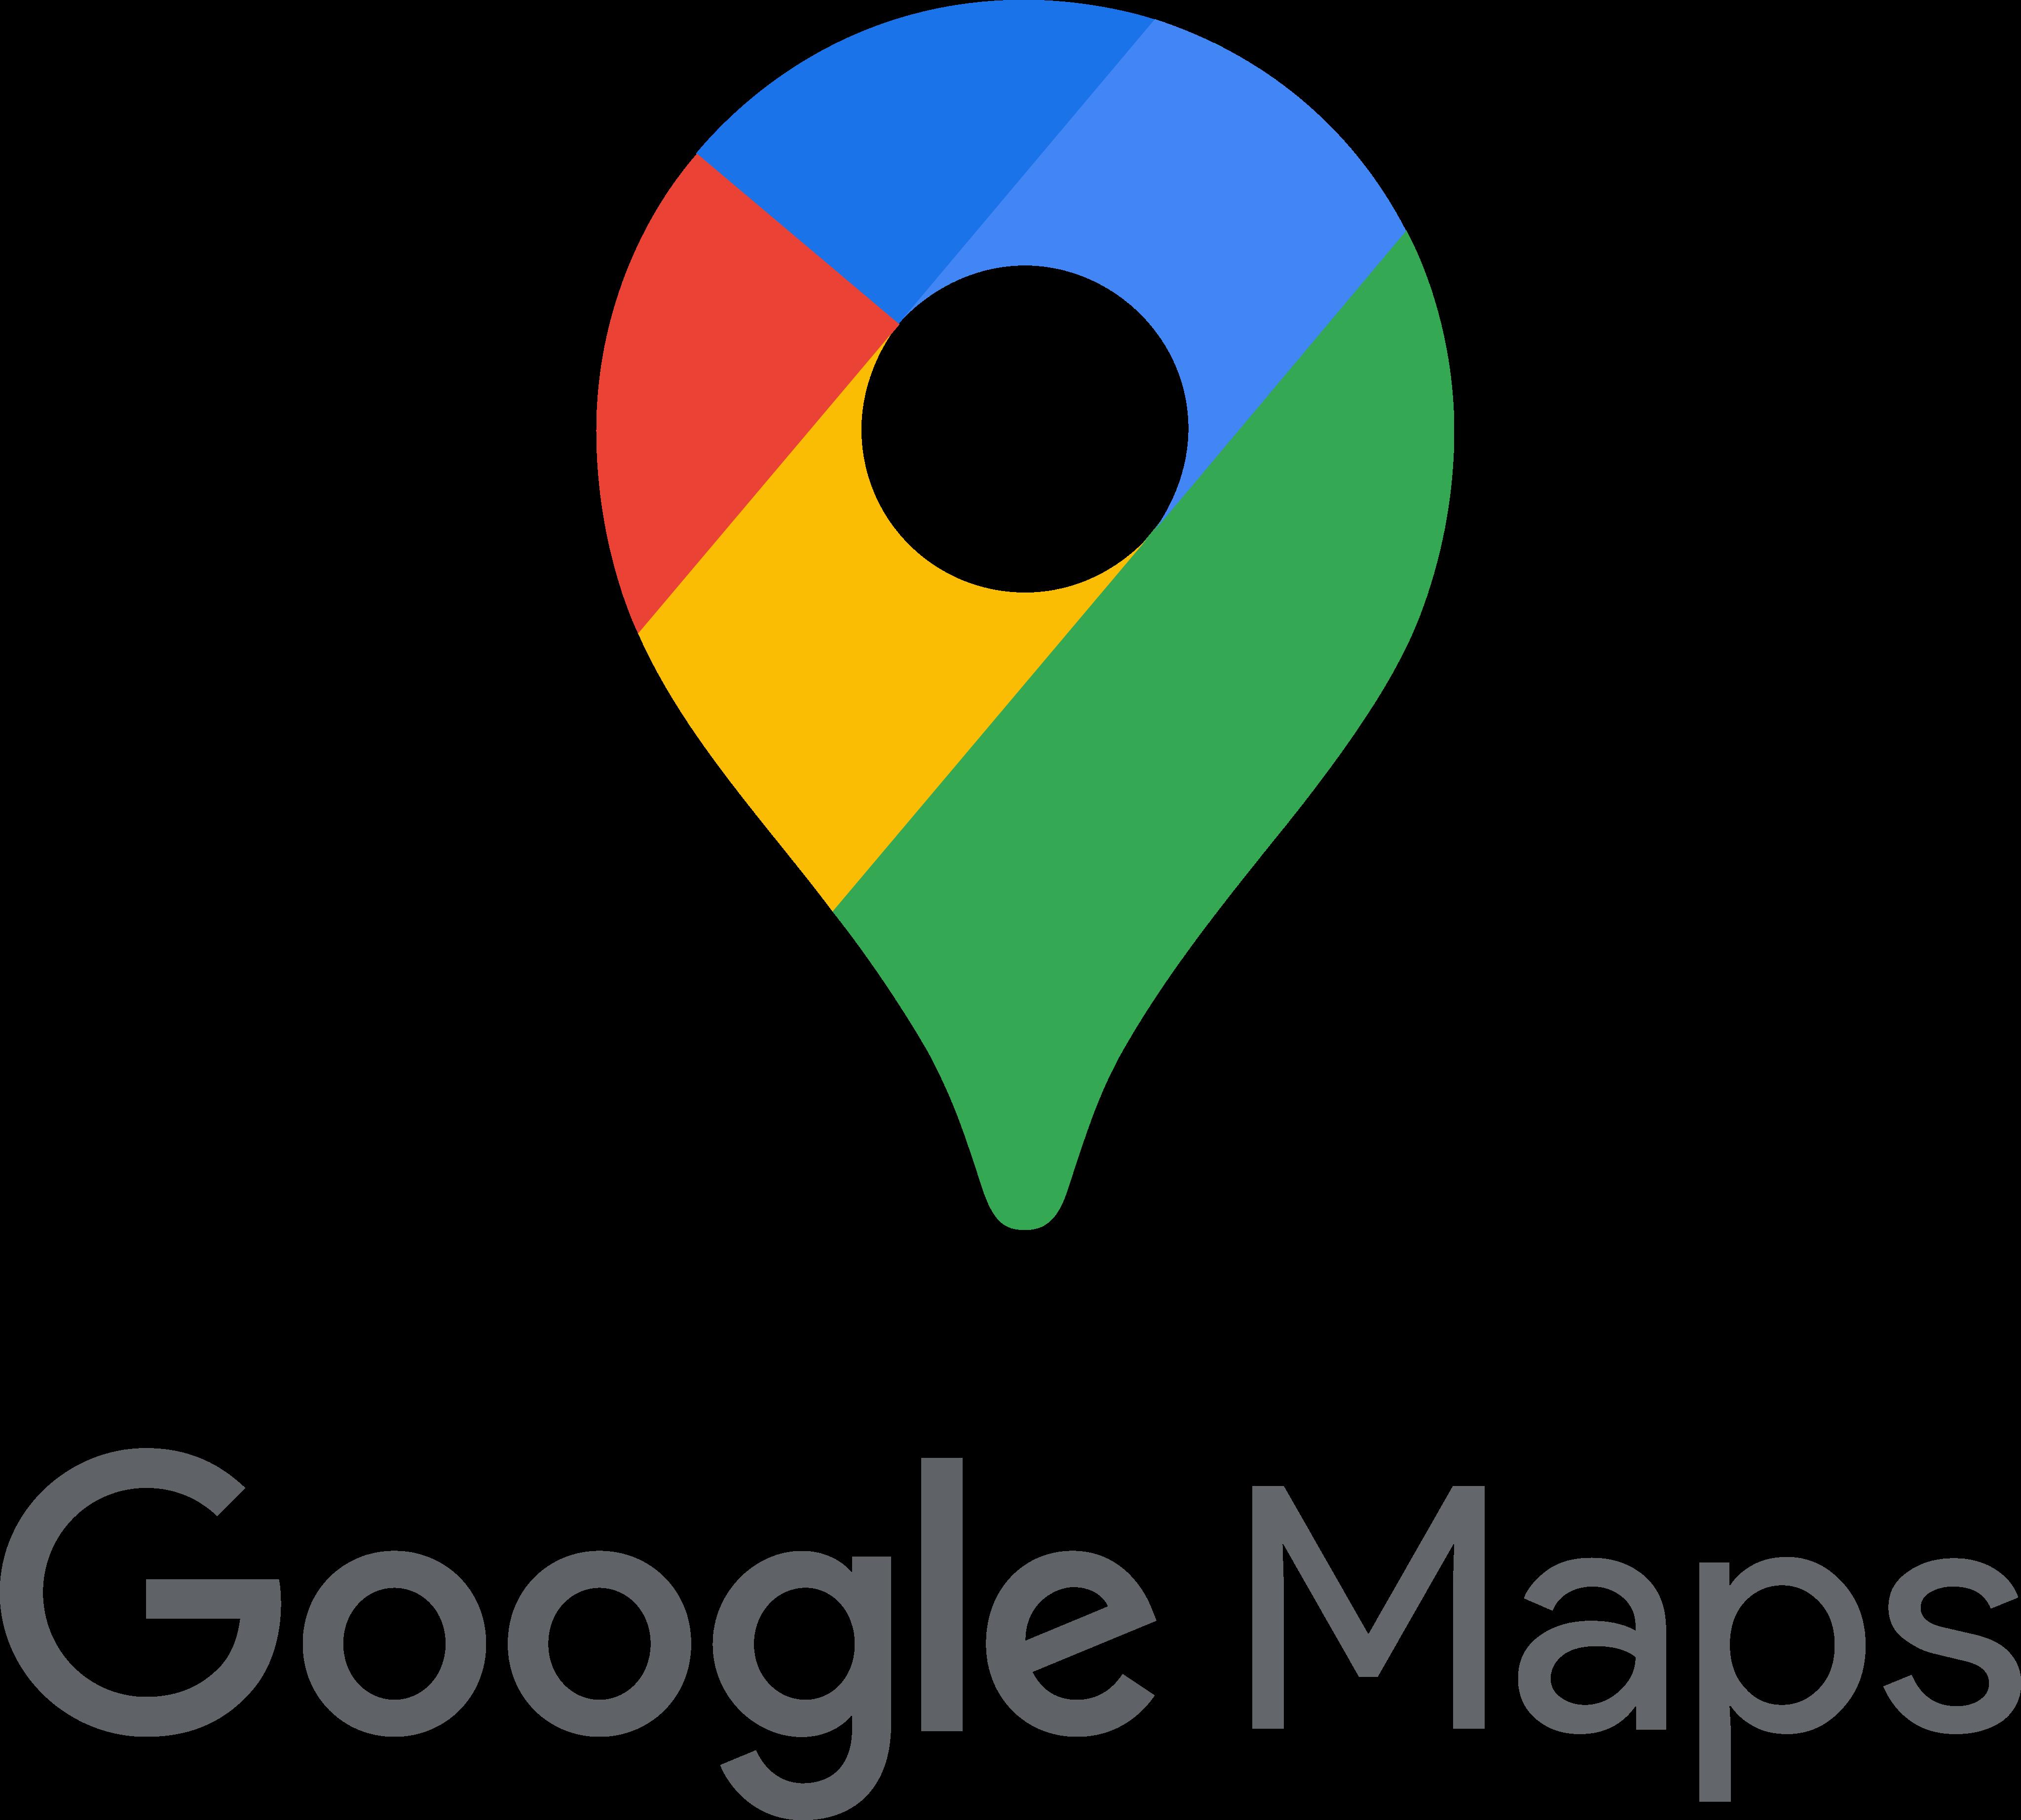 google maps logo 2 1 - Google Maps Logo